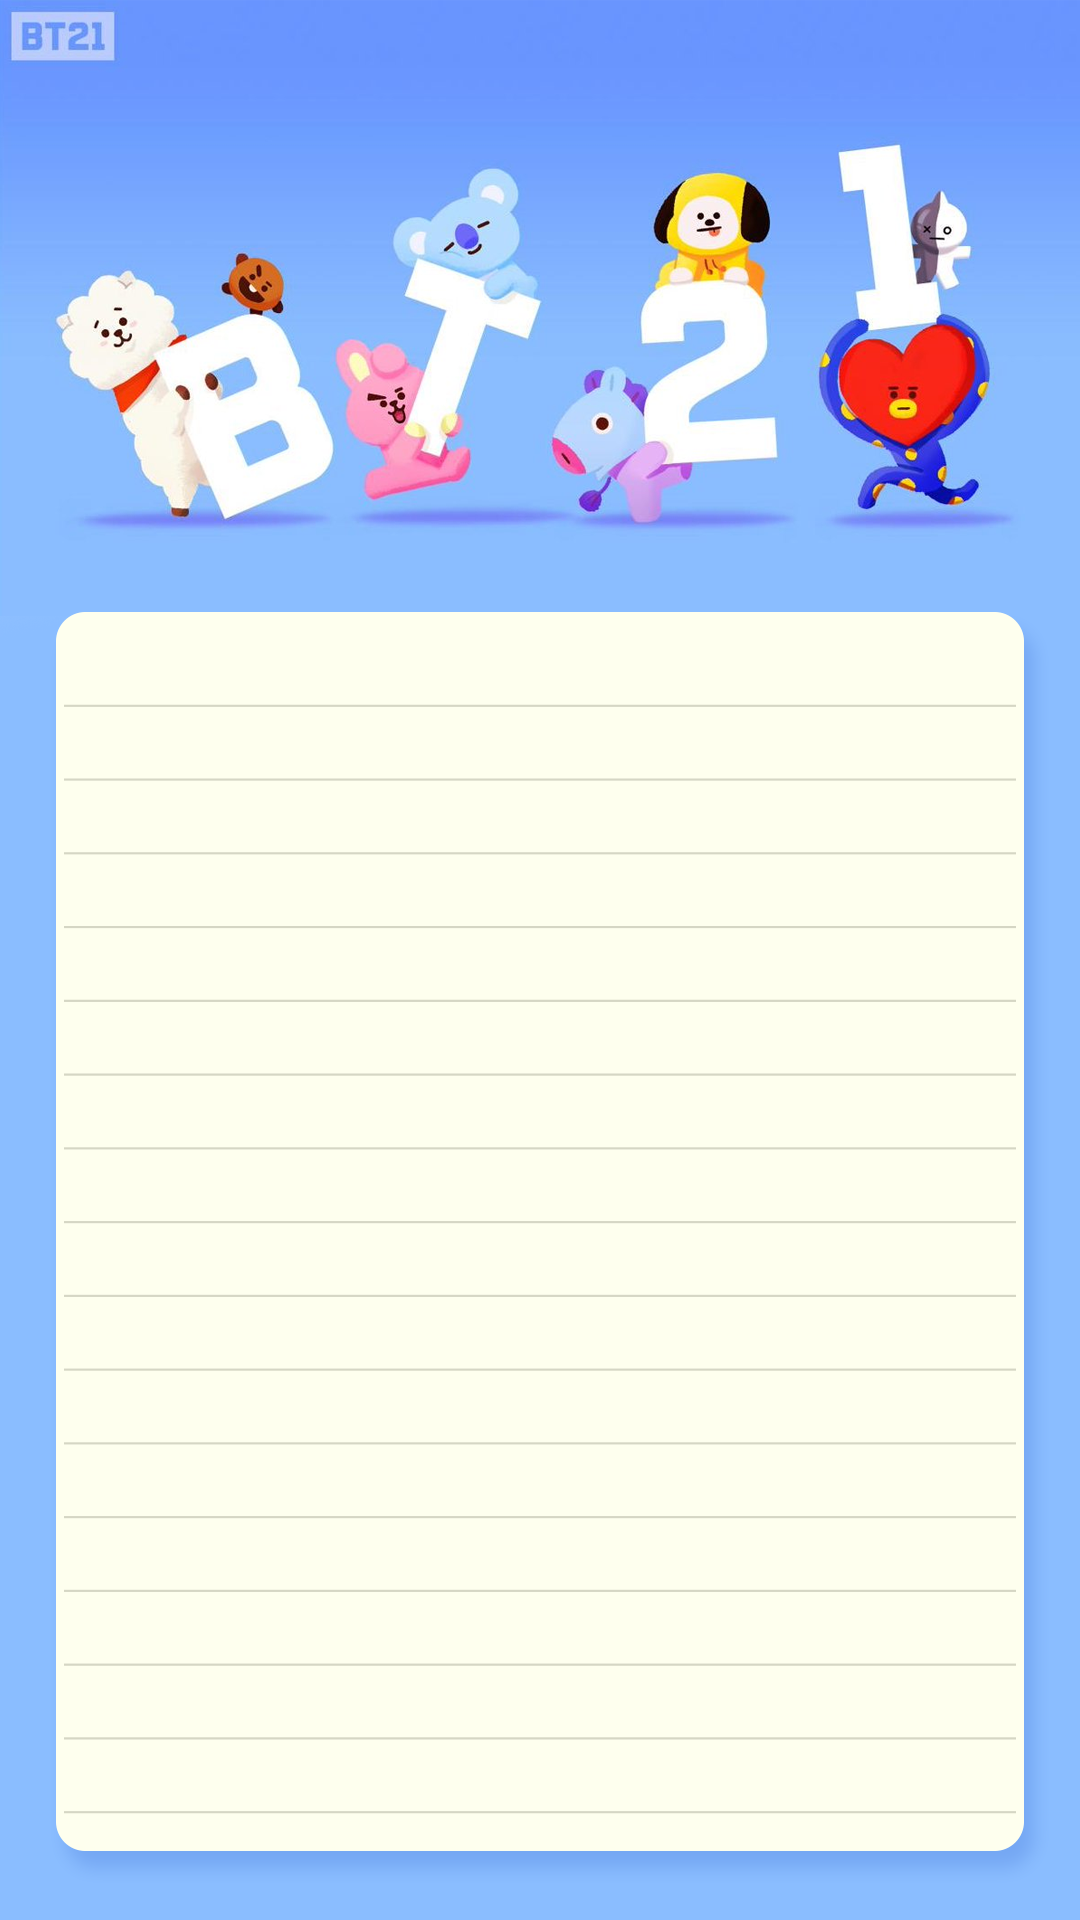 BT21 Memo Pad / BTS Notepads / K-POP / Letter Memo Pad